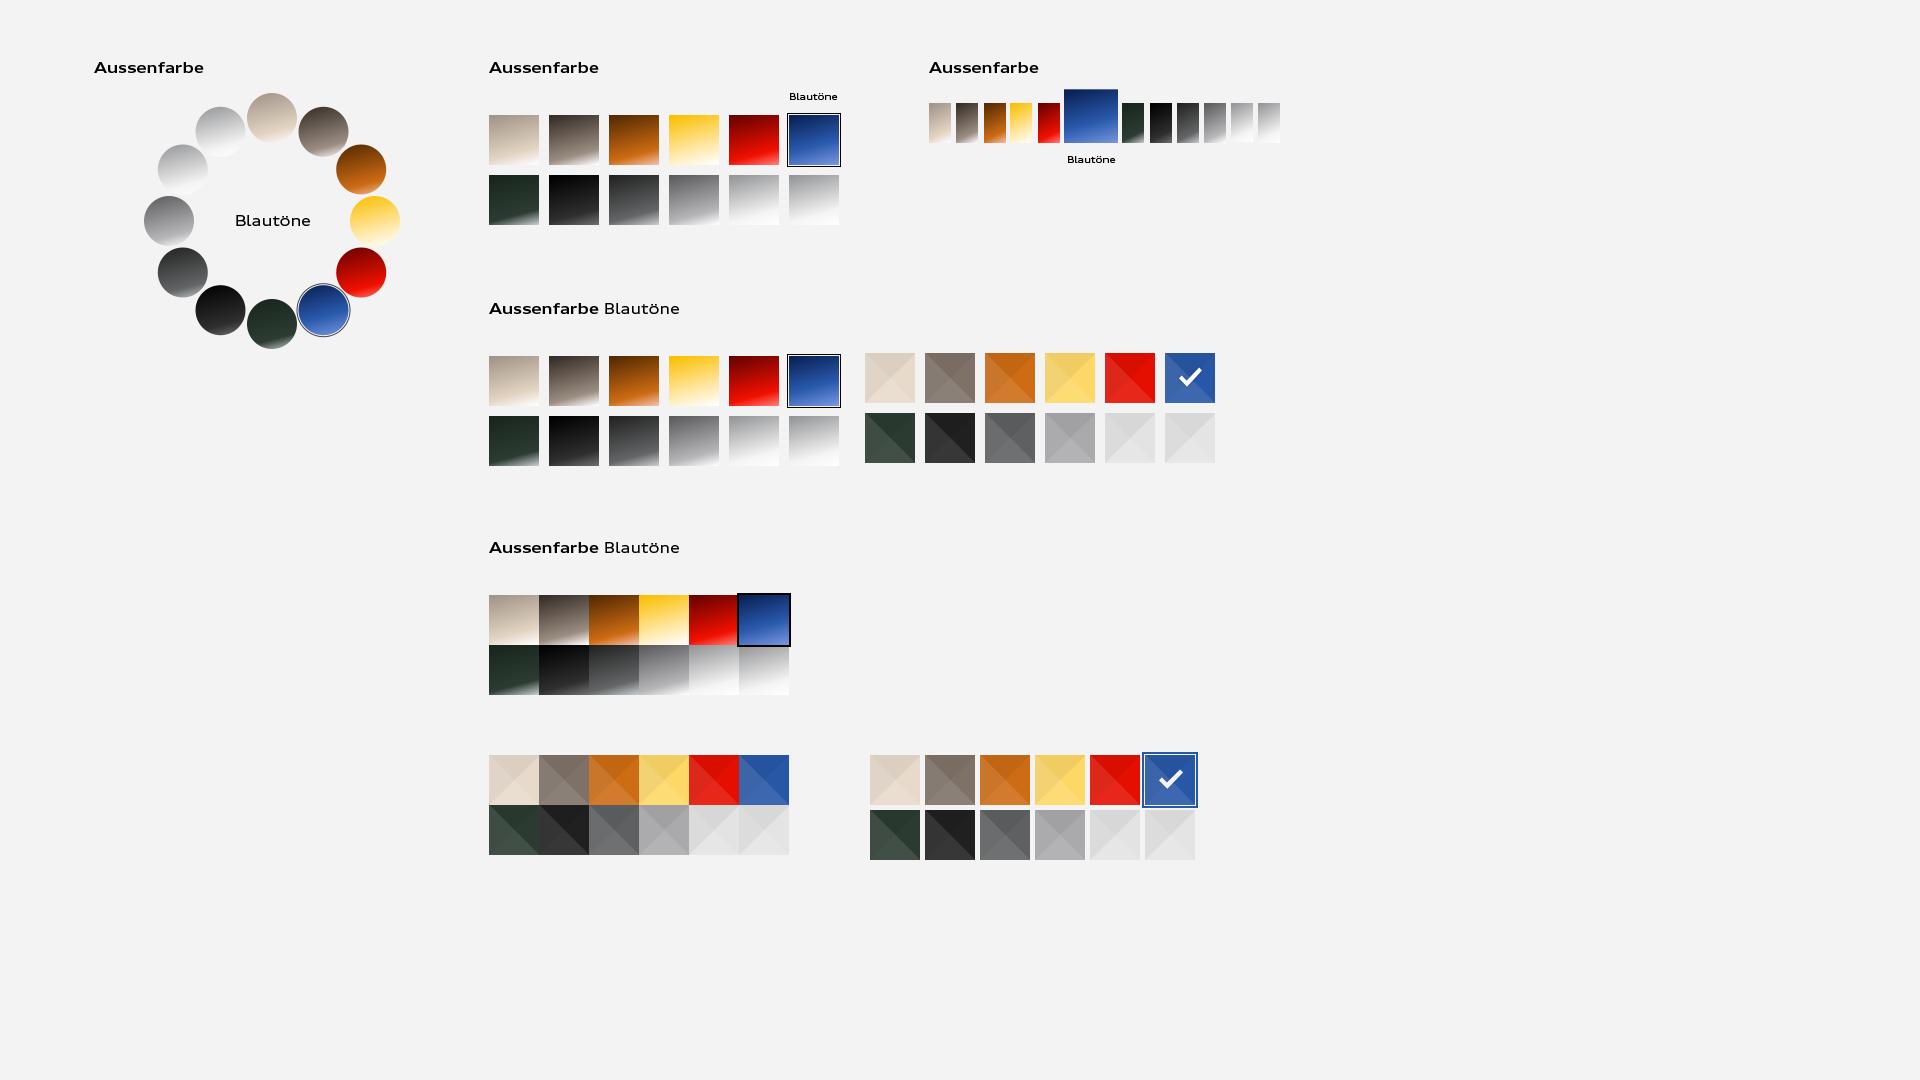 Colorpicker Detailfilter